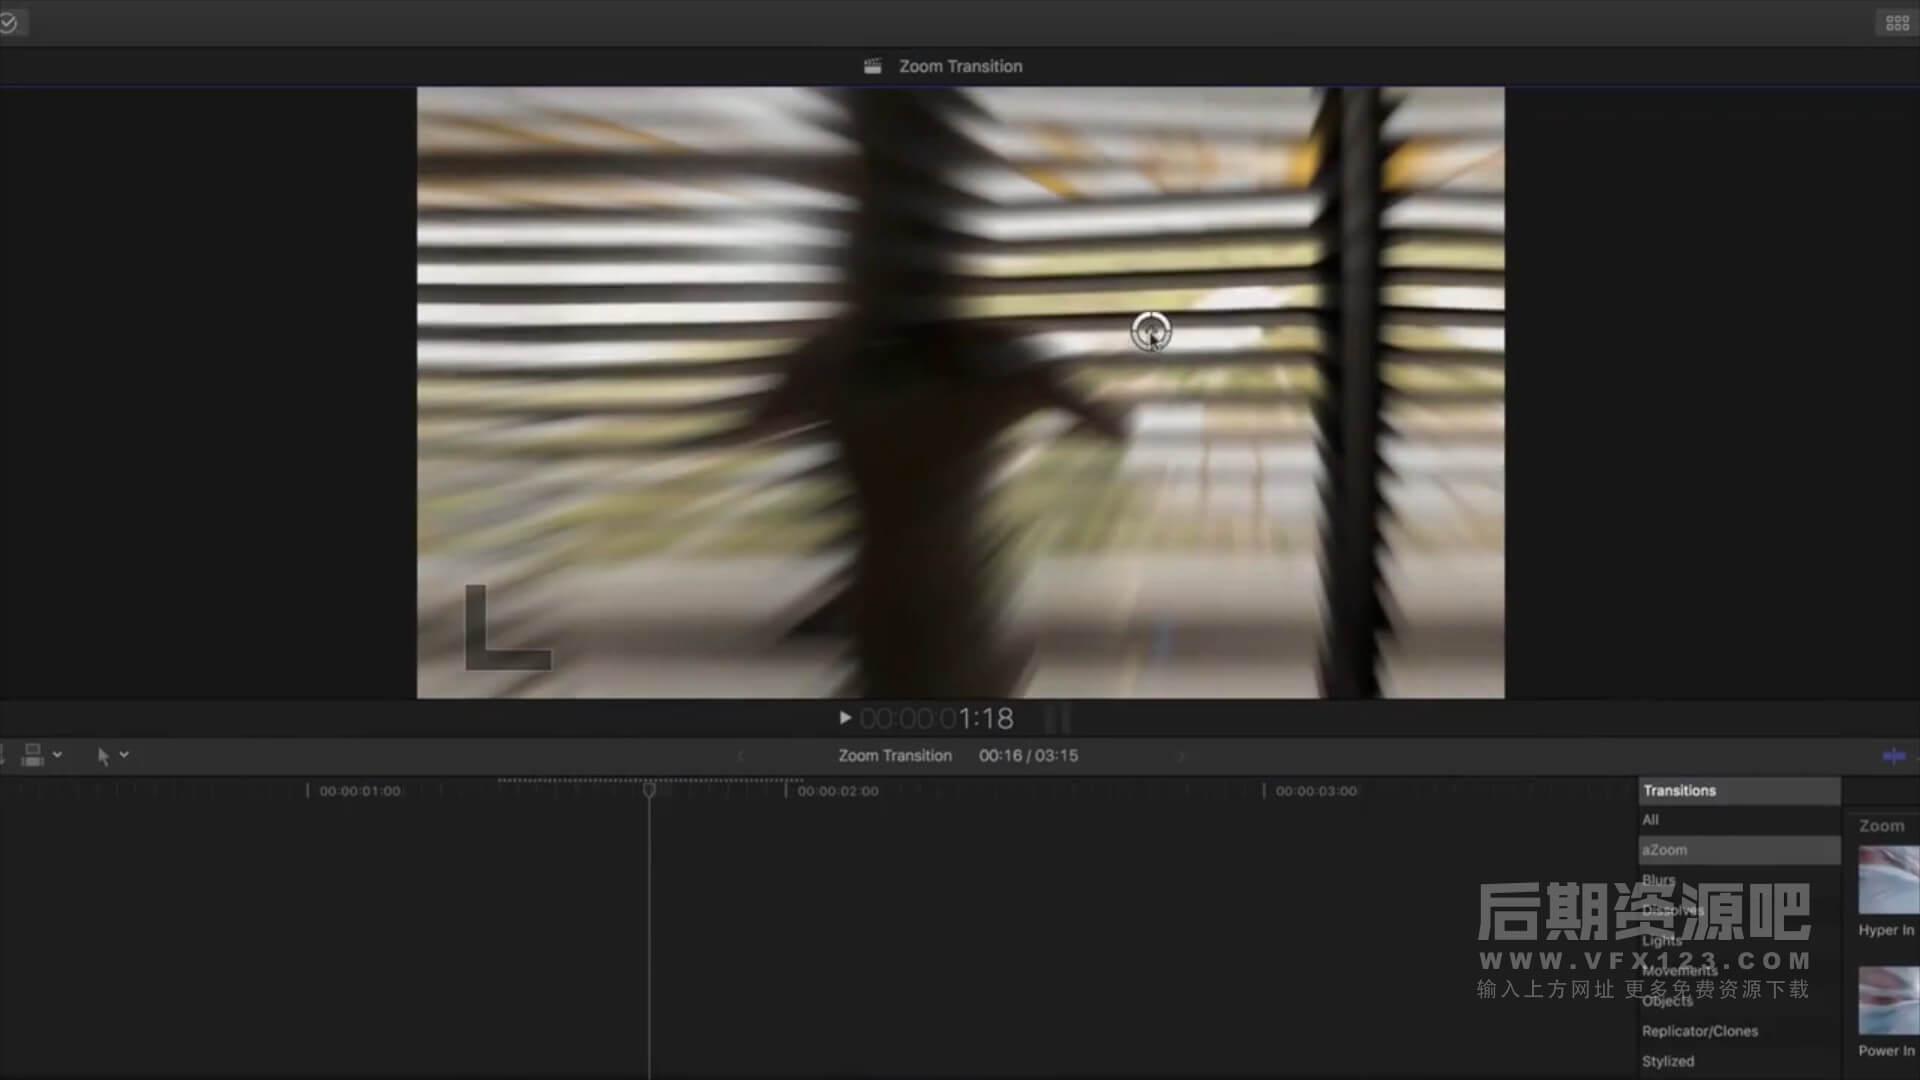 FCPX转场插件 94个摄像机镜头扭曲变形推拉缩放切换动感模糊 vlog常用转场